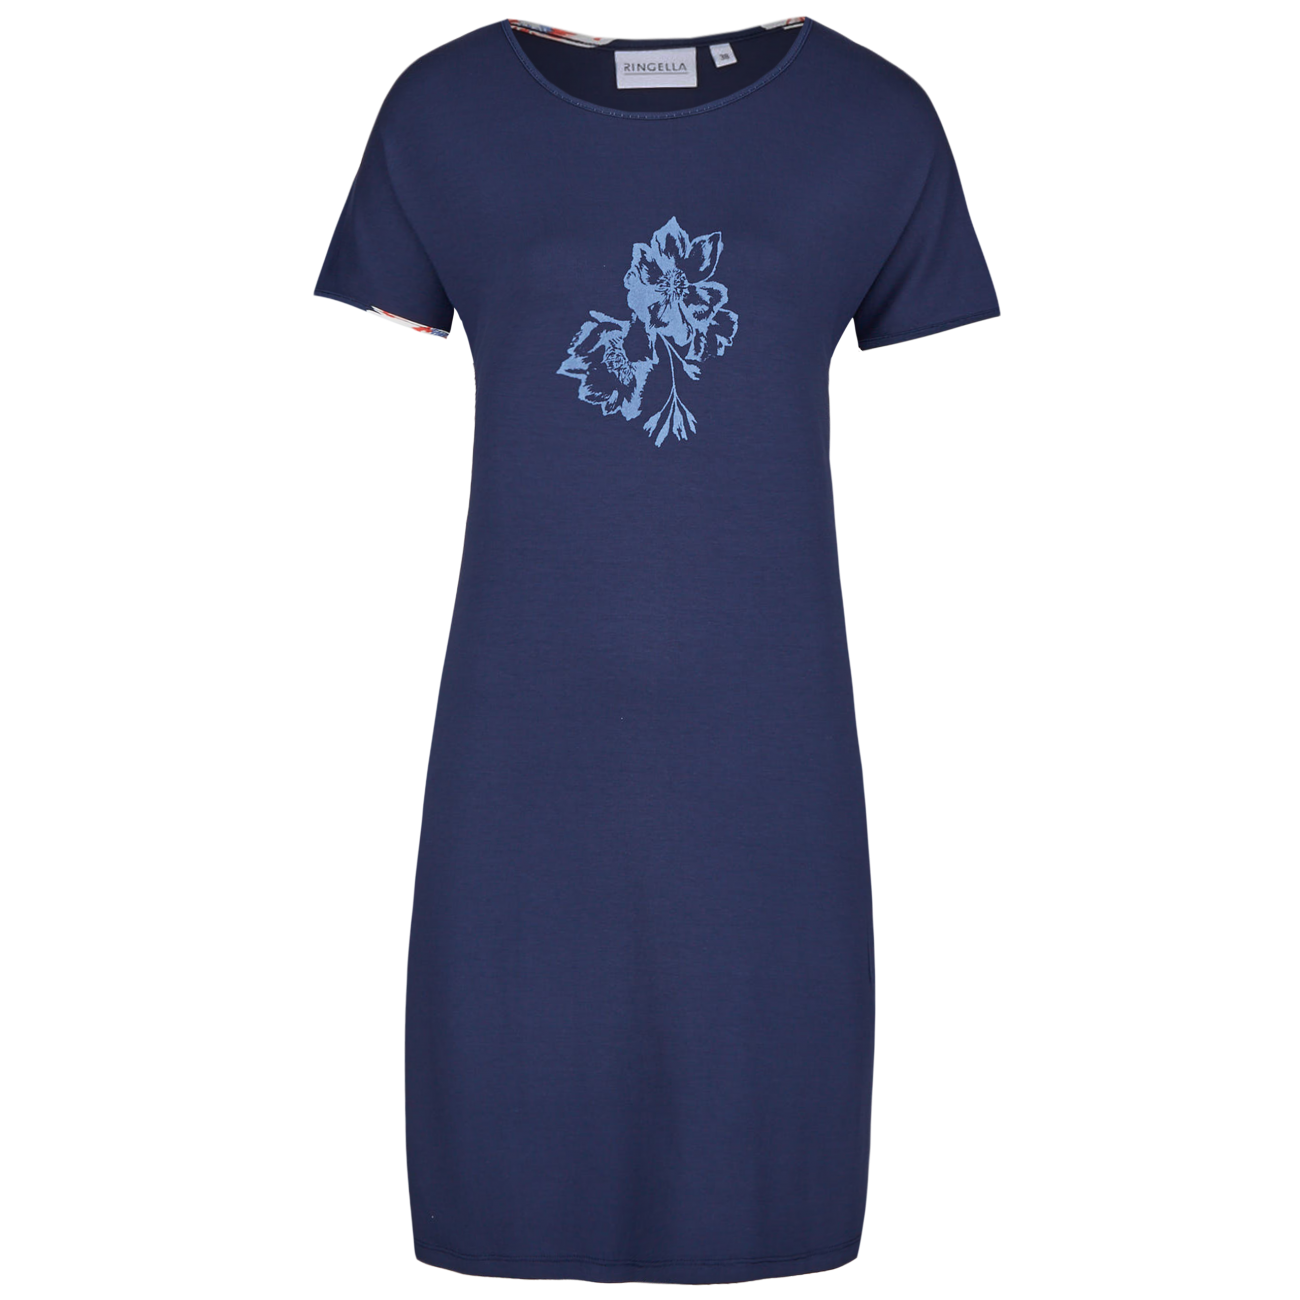 Nachthemd mit Motivdruck dark navy | 36